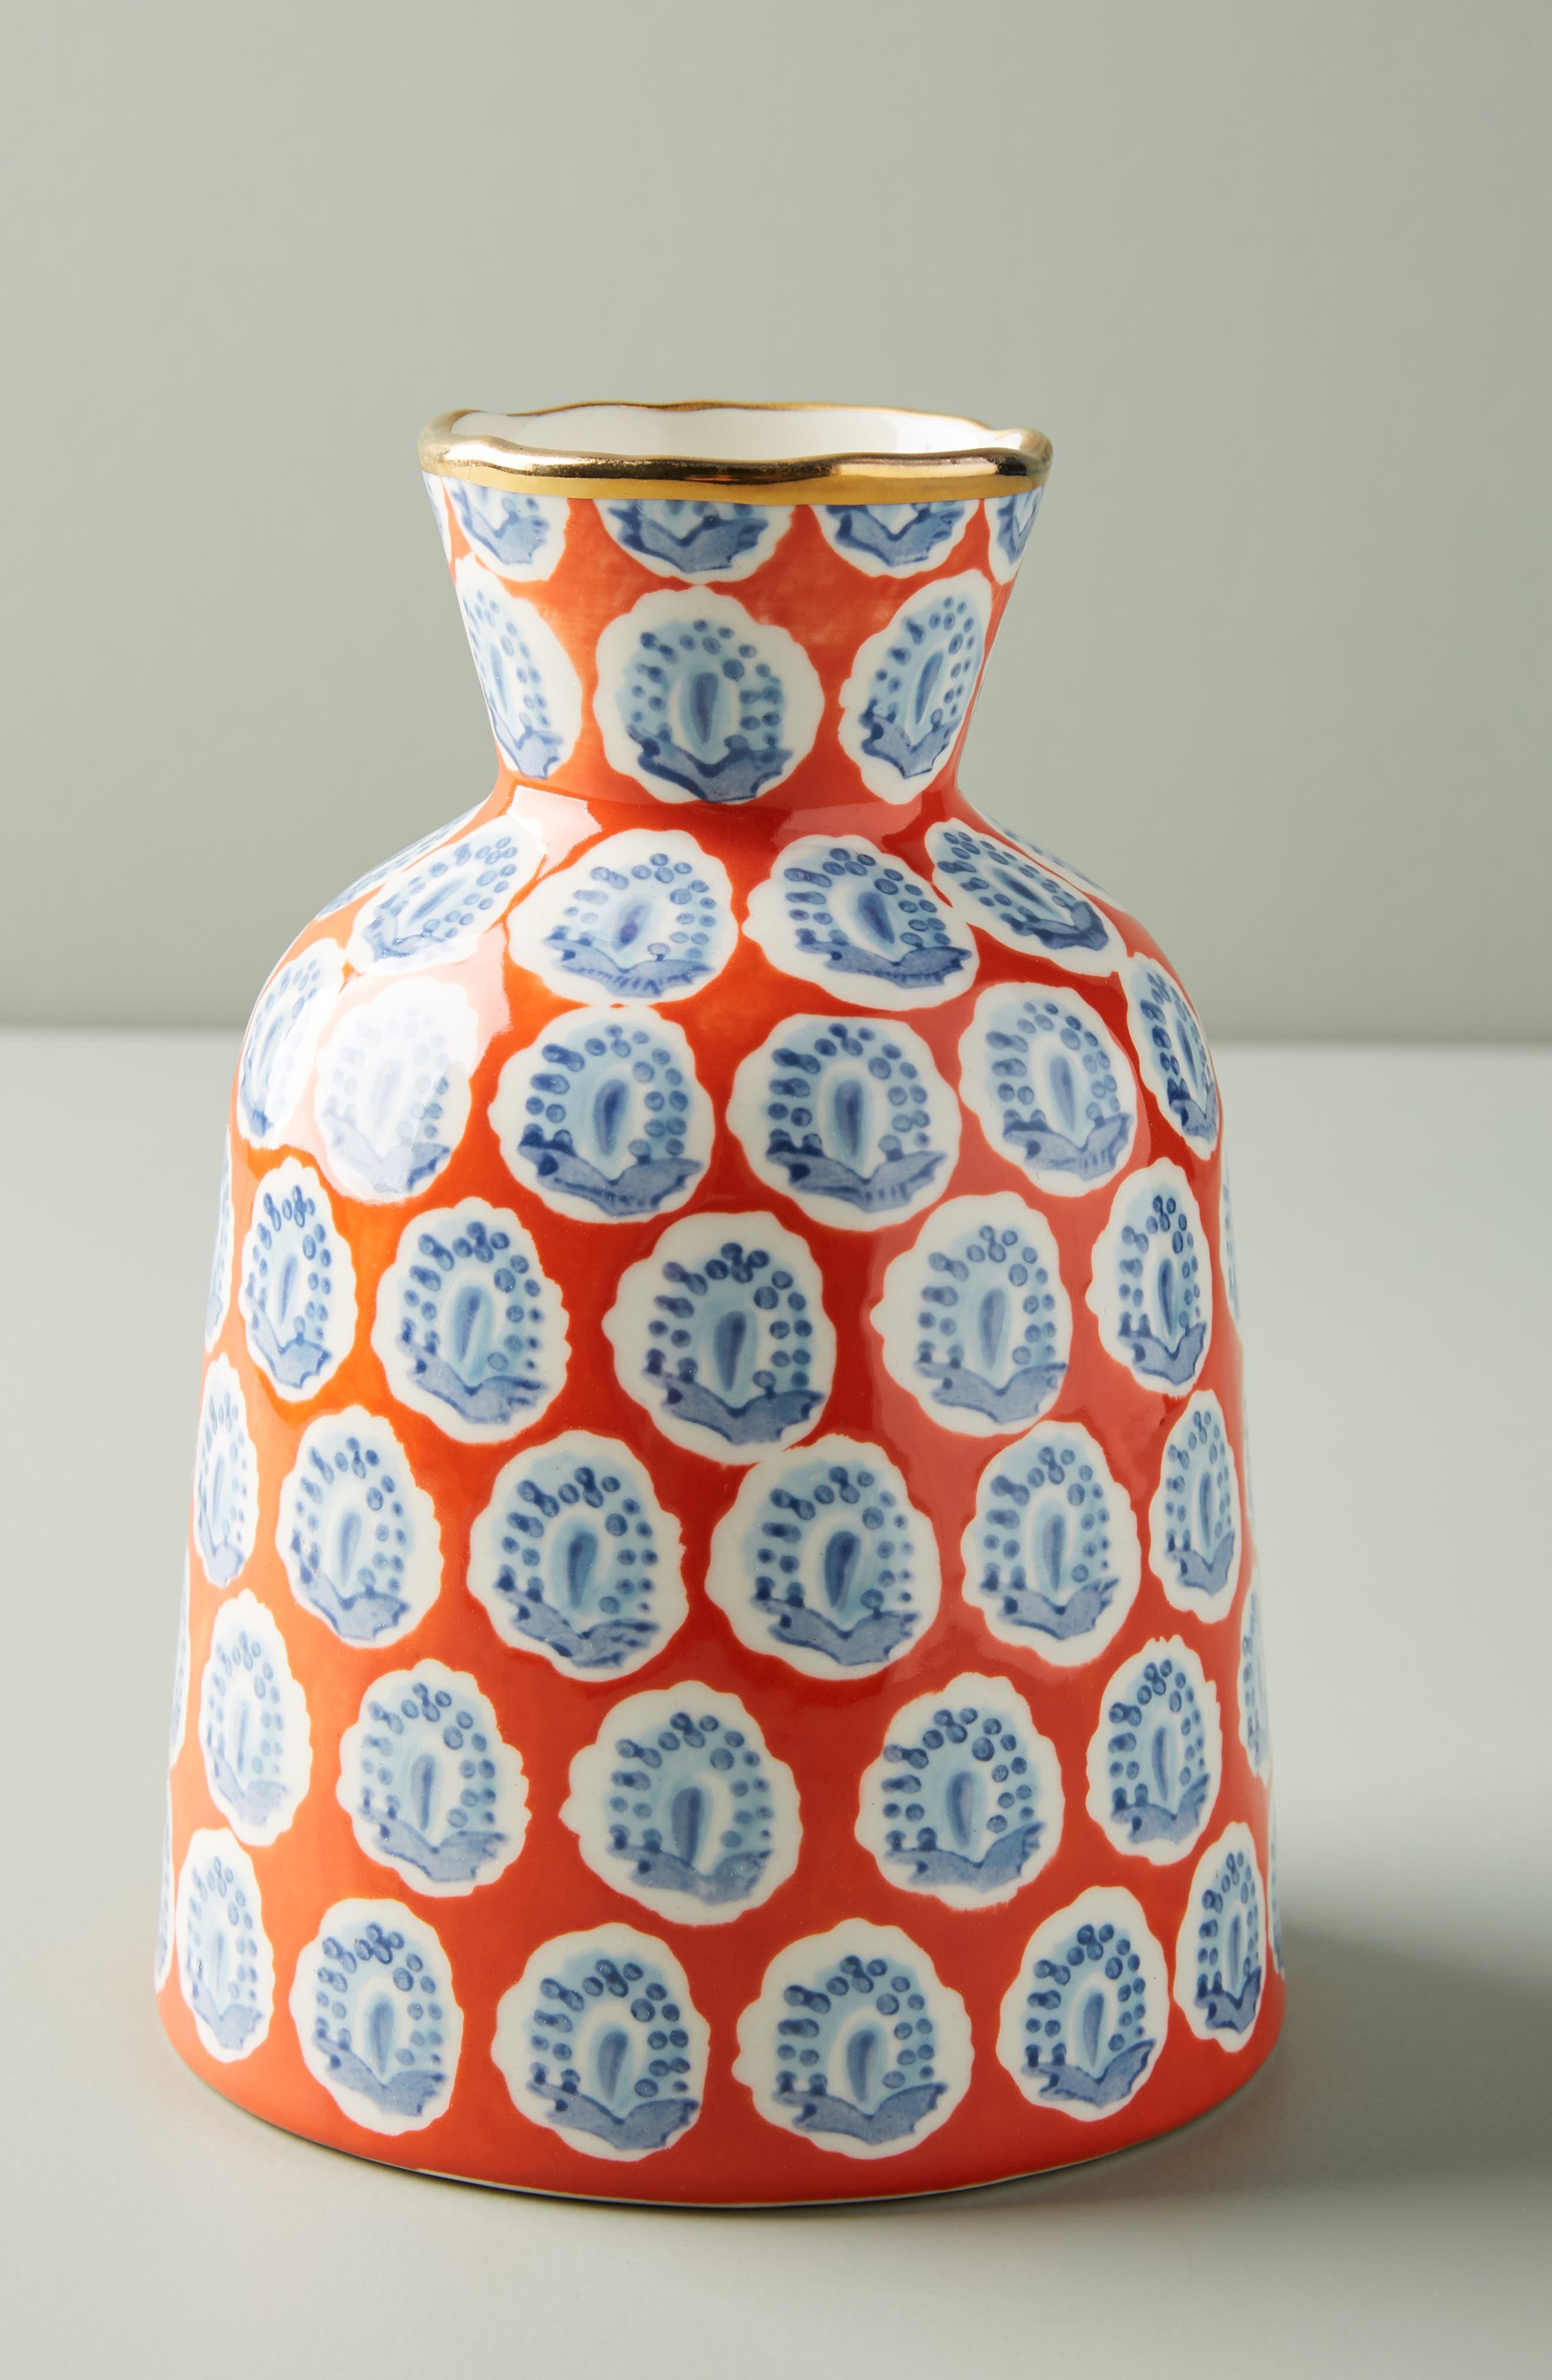 ANTHROPOLOGIE,                             Small Elsa Vase,                             Main thumbnail 1, color,                             WARM